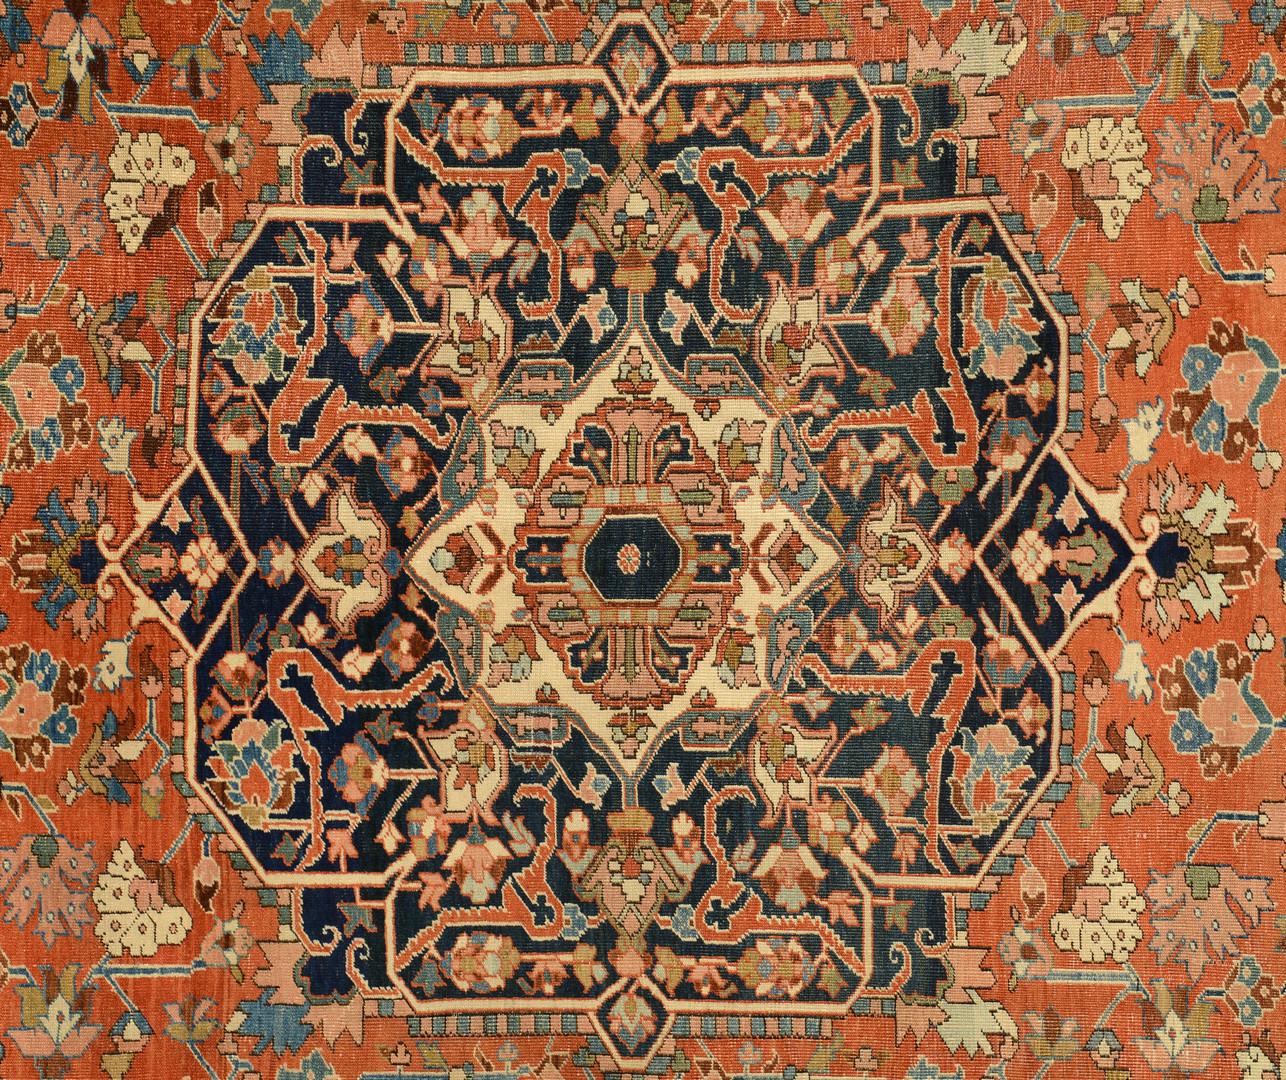 Lot 817: Persian Heriz Carpet, 12.6 x 8.3